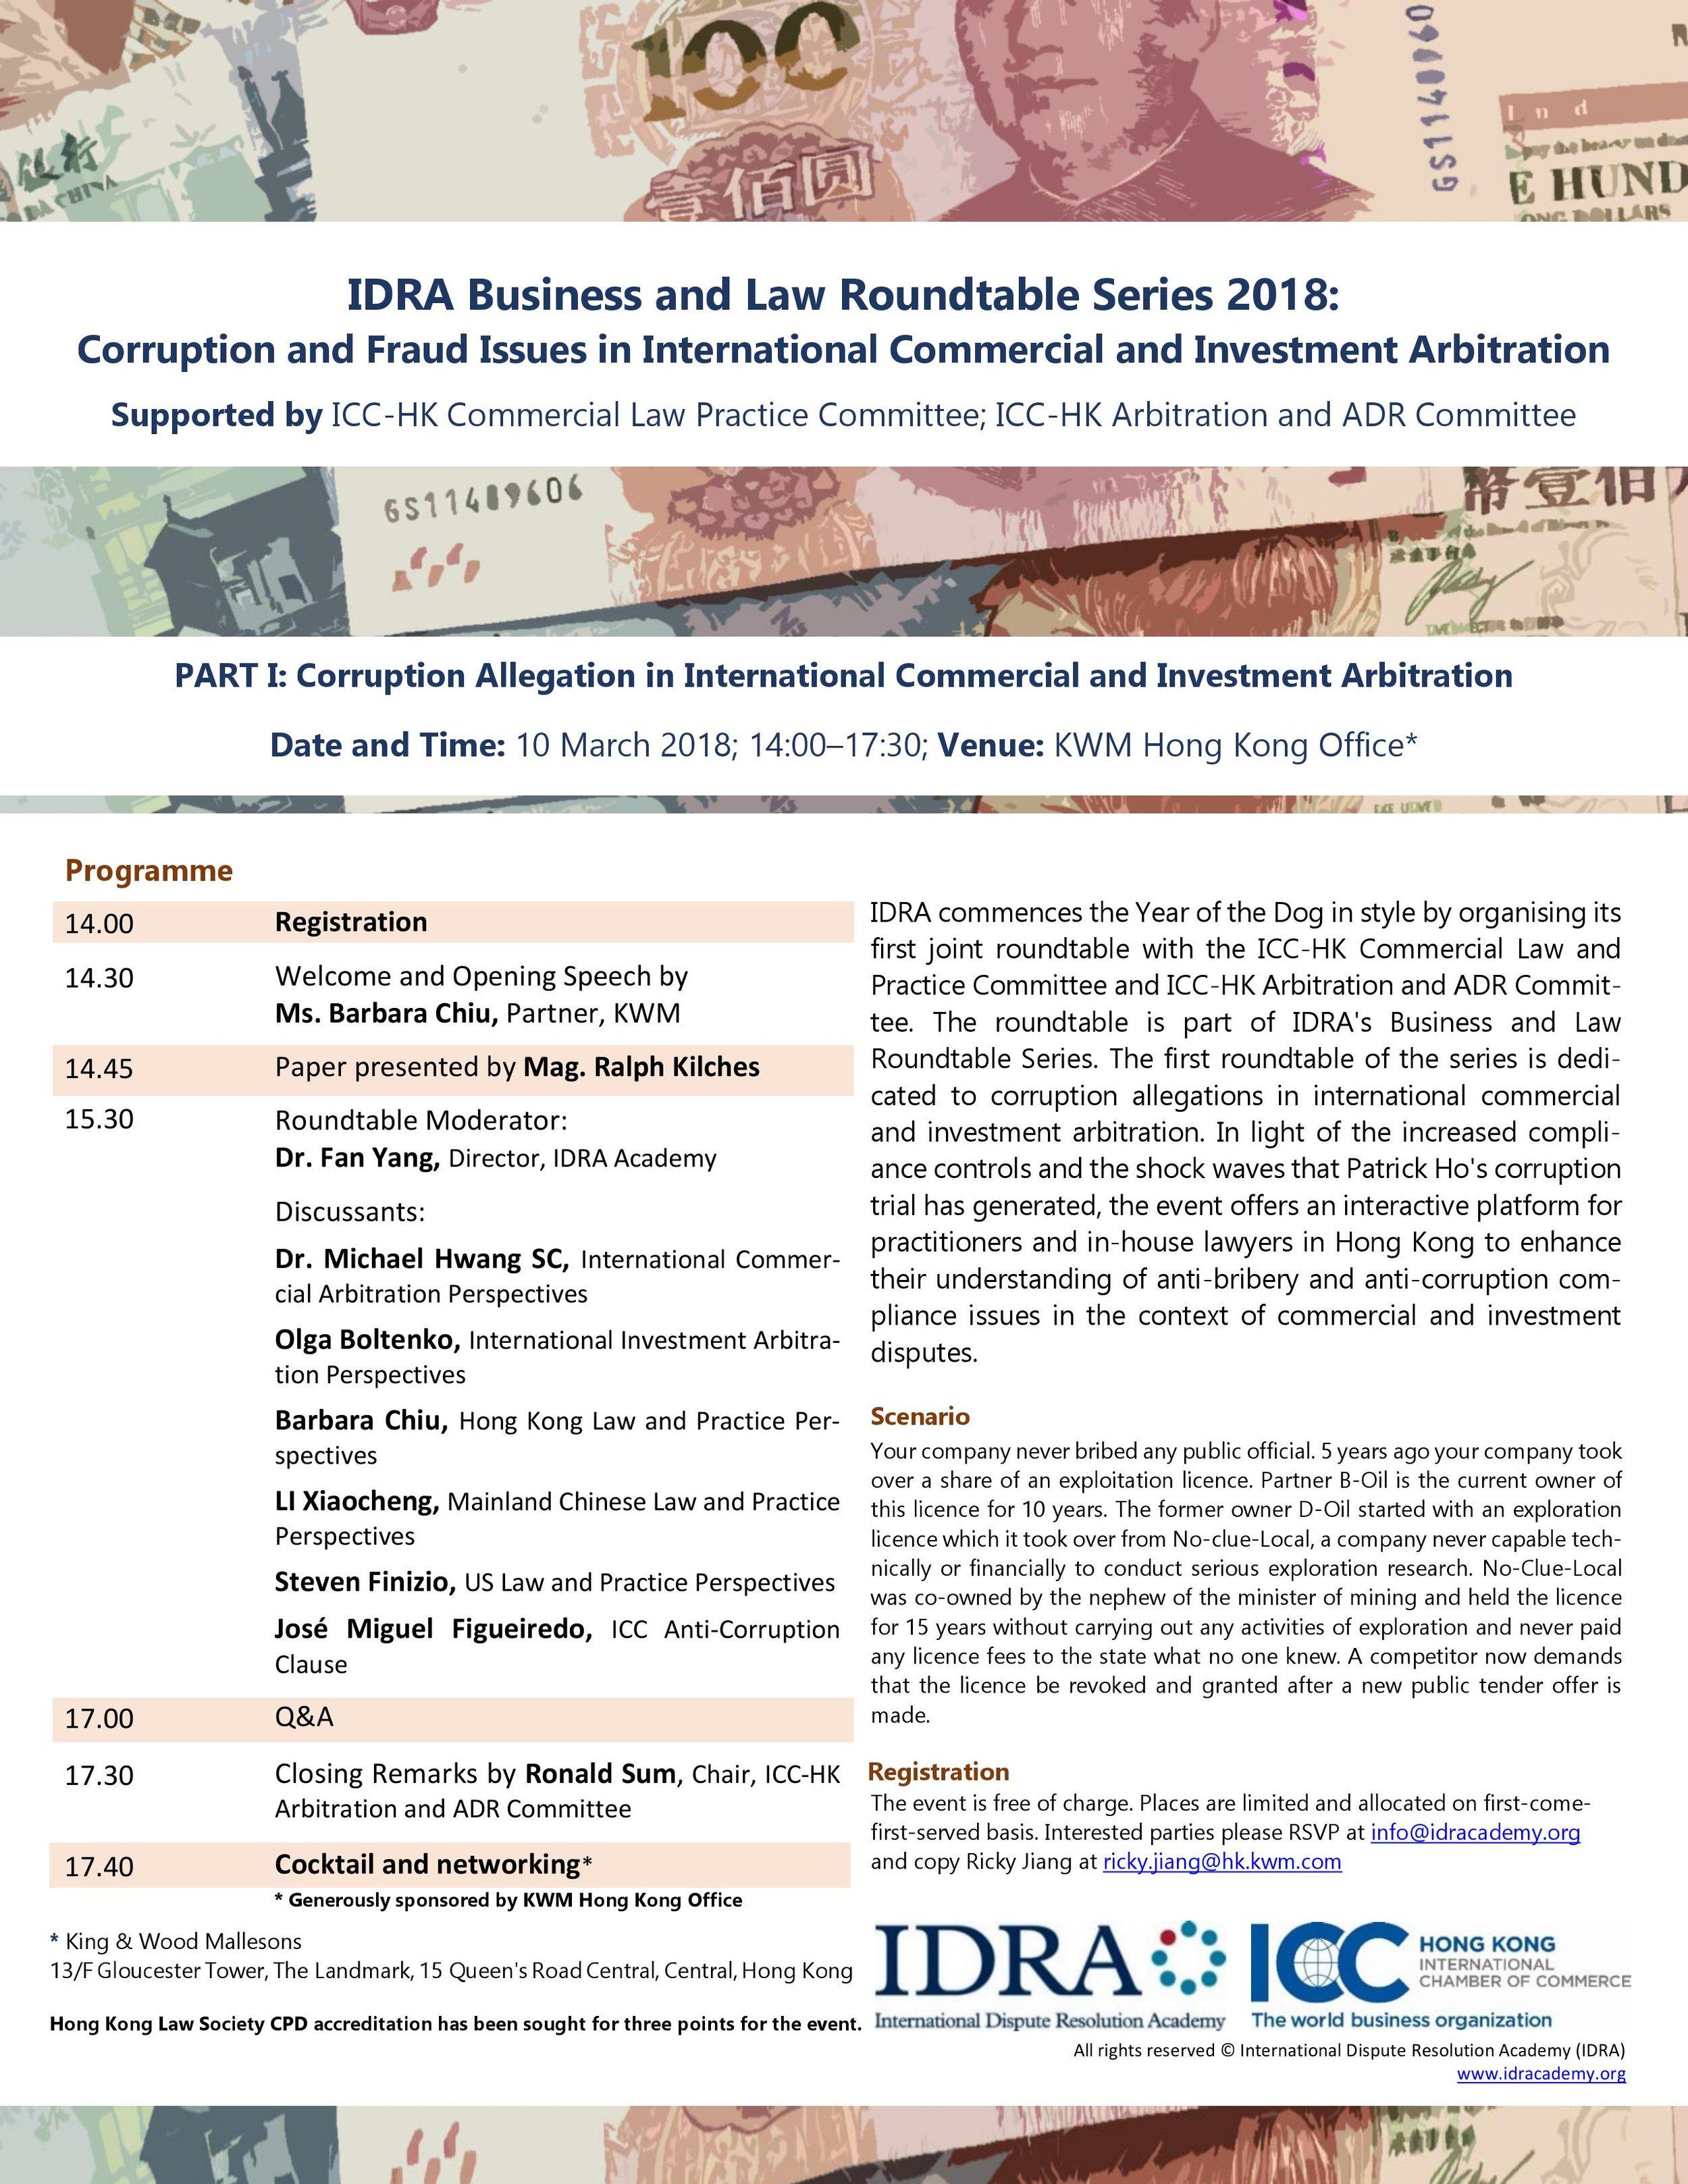 IDRA Public Roundtable Series 2018 - Flyer 21.02.2018.jpg